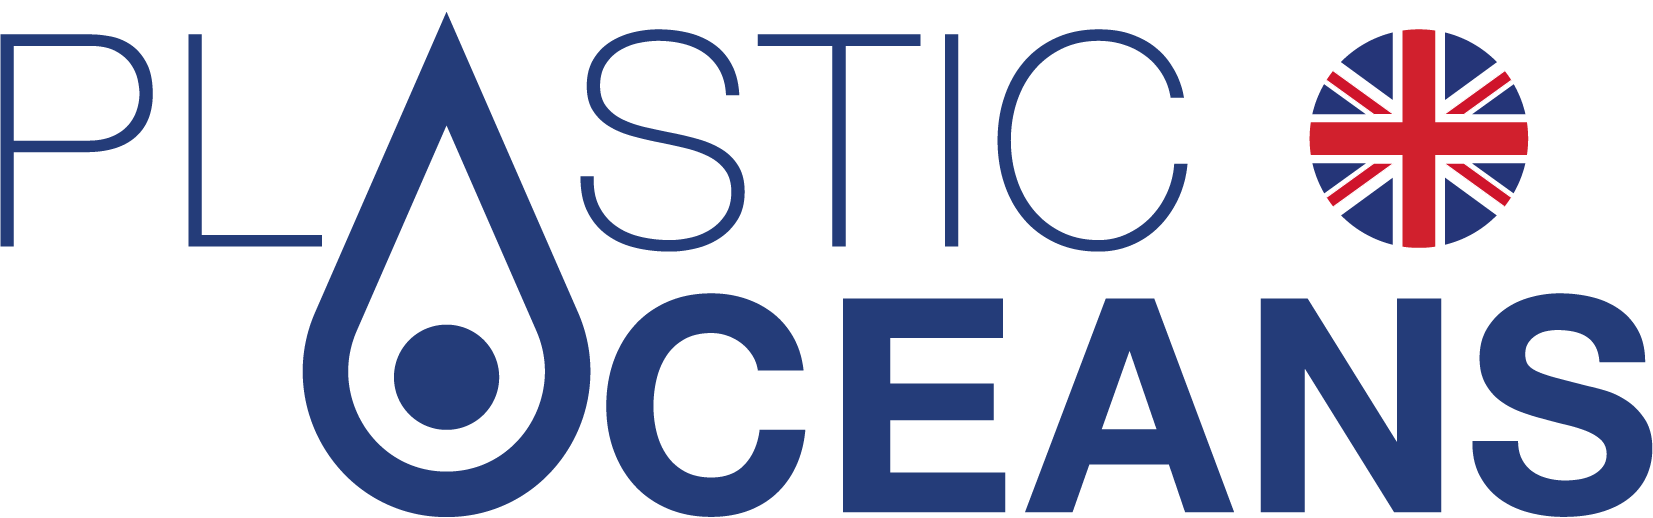 Plastic Oceans Supporter